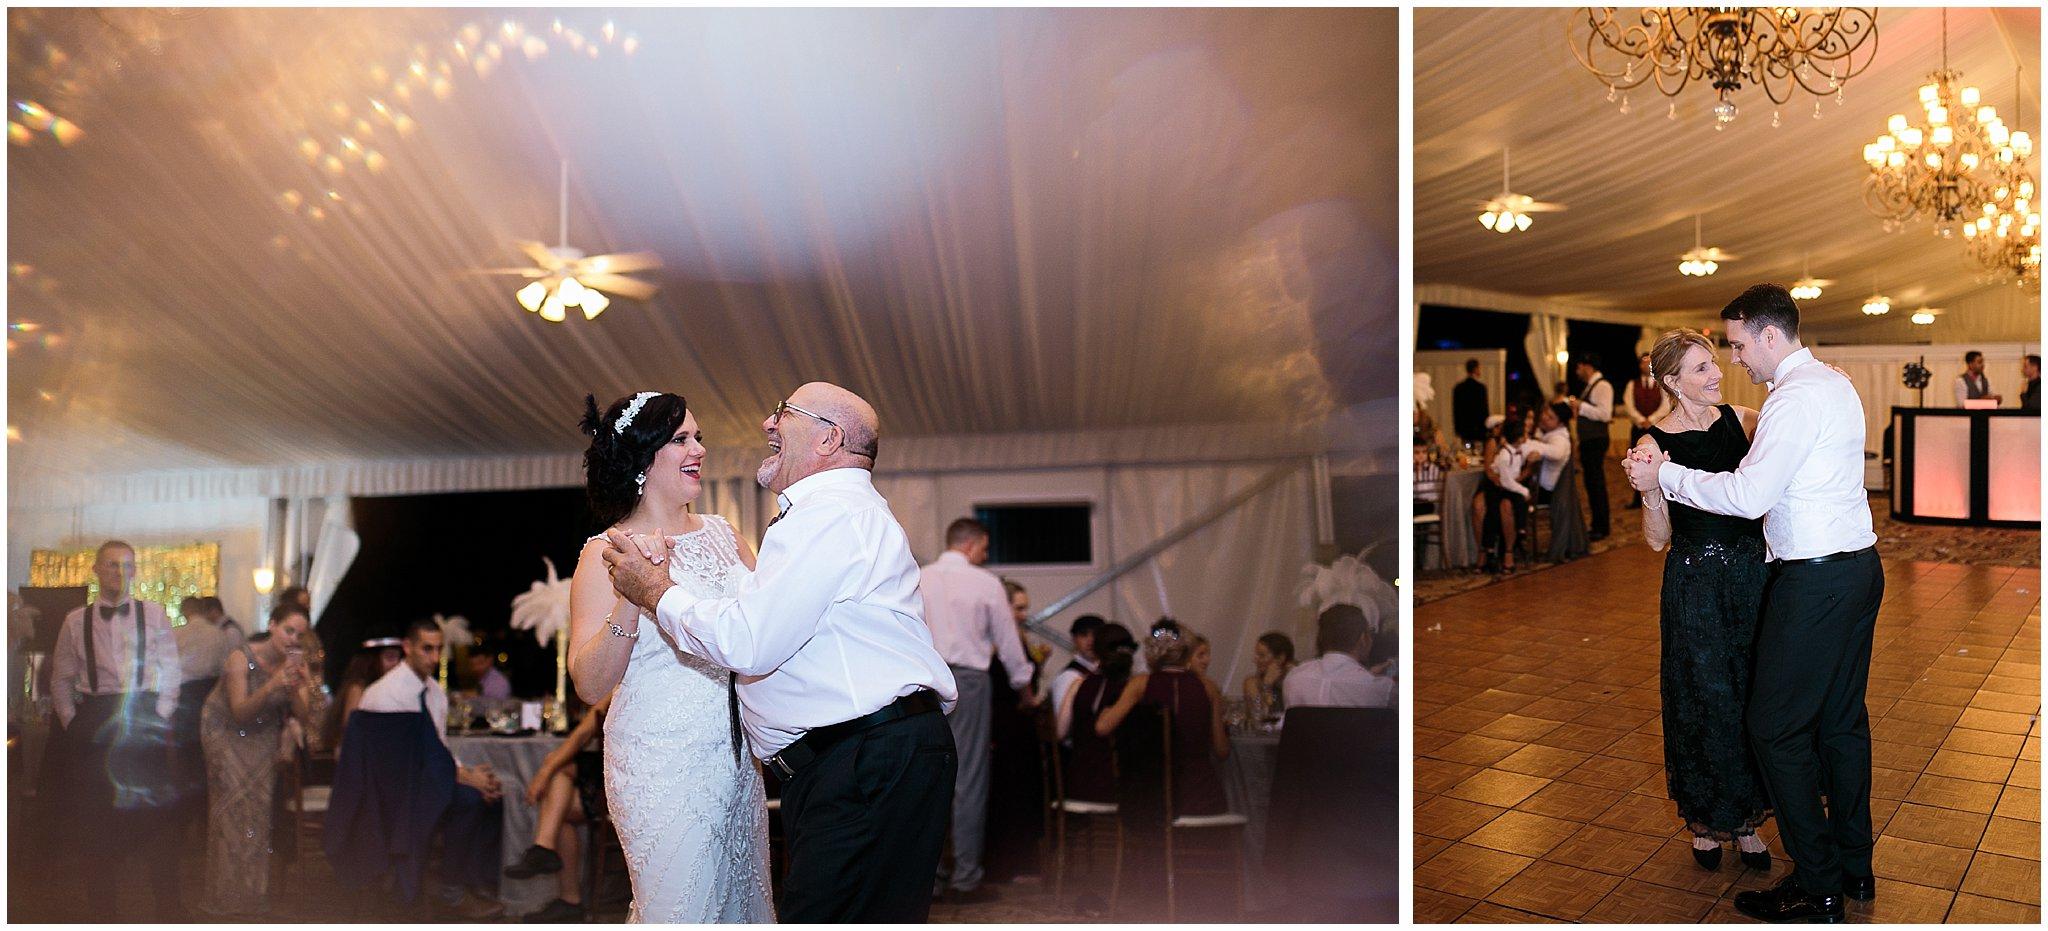 West Hills Country Club Wedding Gatsby Wedding Roaring Twenties Wedding Hudson Valley Wedding Photographer Sweet Alice Photography69.jpg